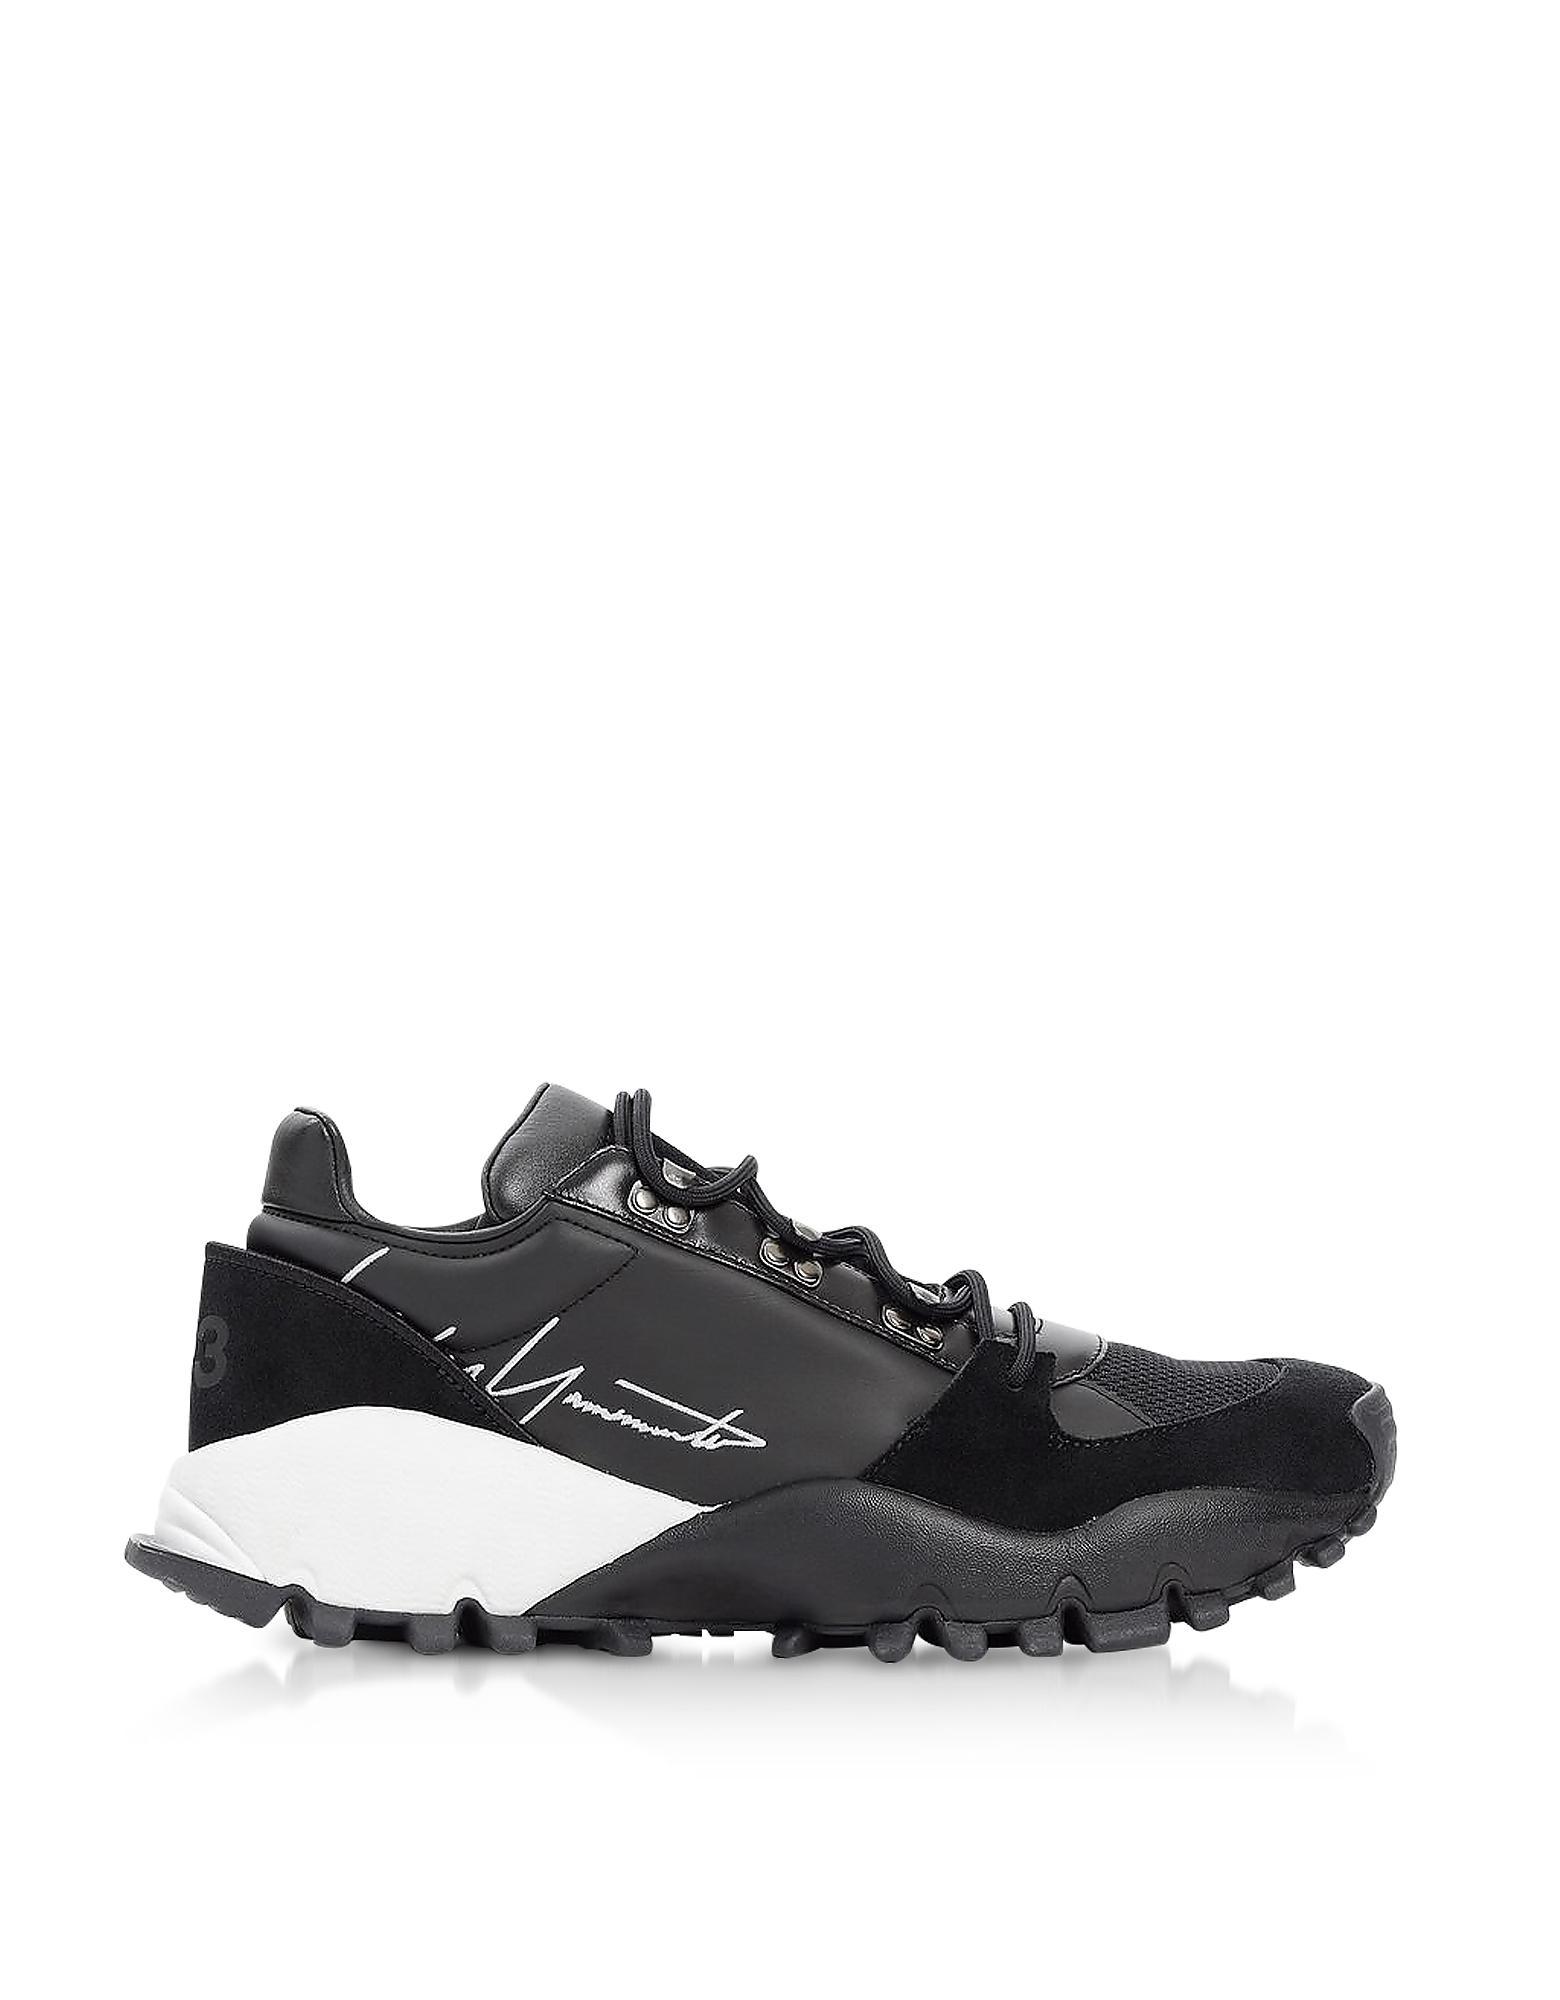 Y-3 Black Kyoi Trail Sneakers